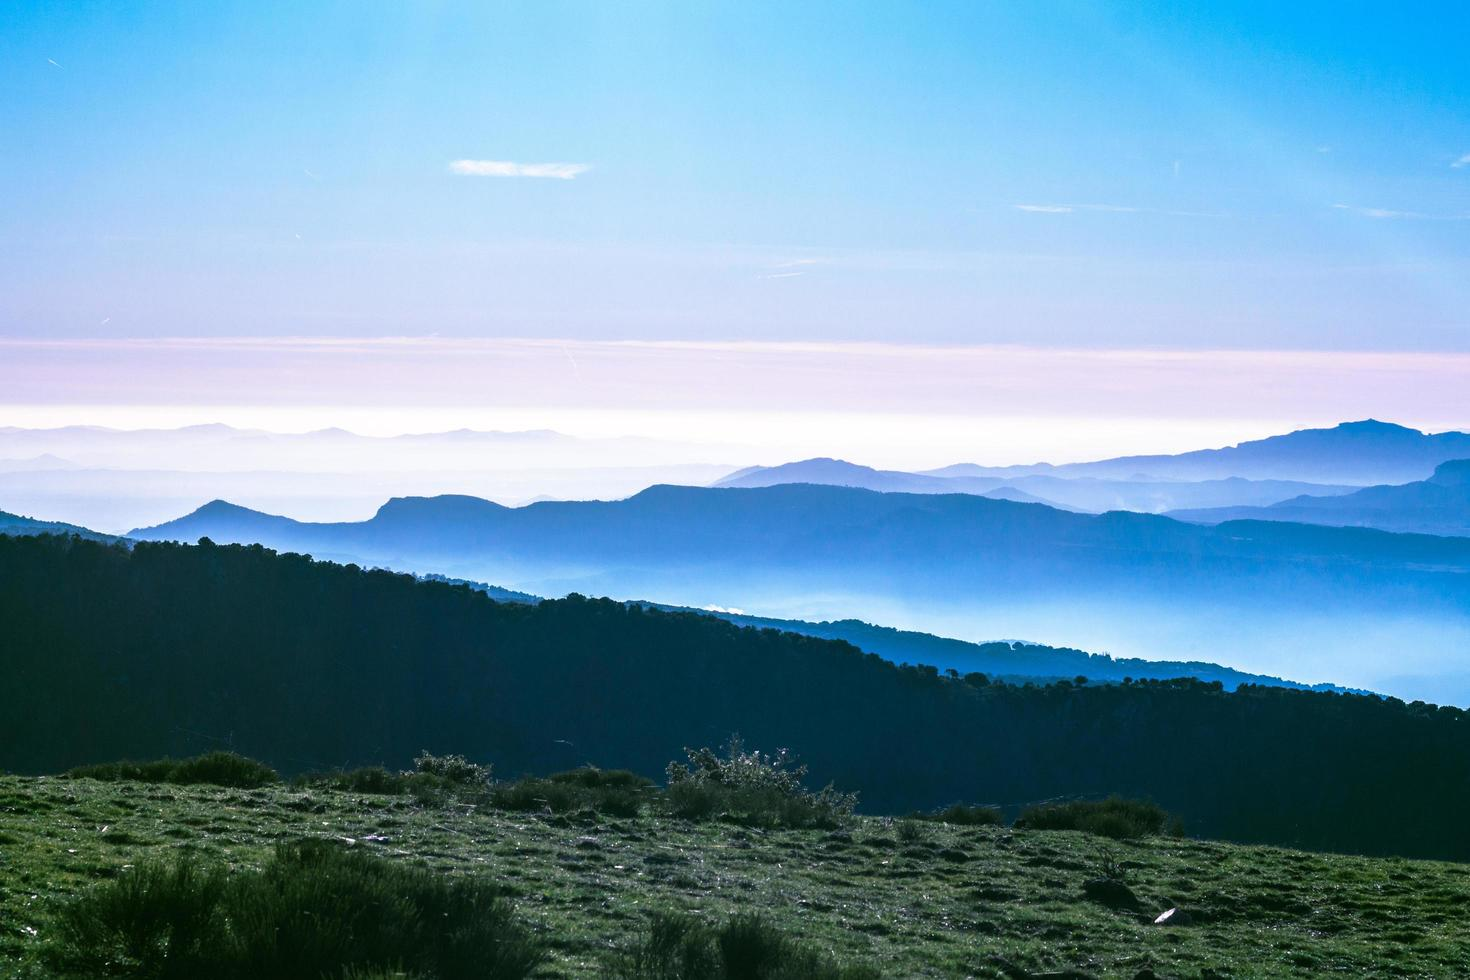 bergen en groen gras foto